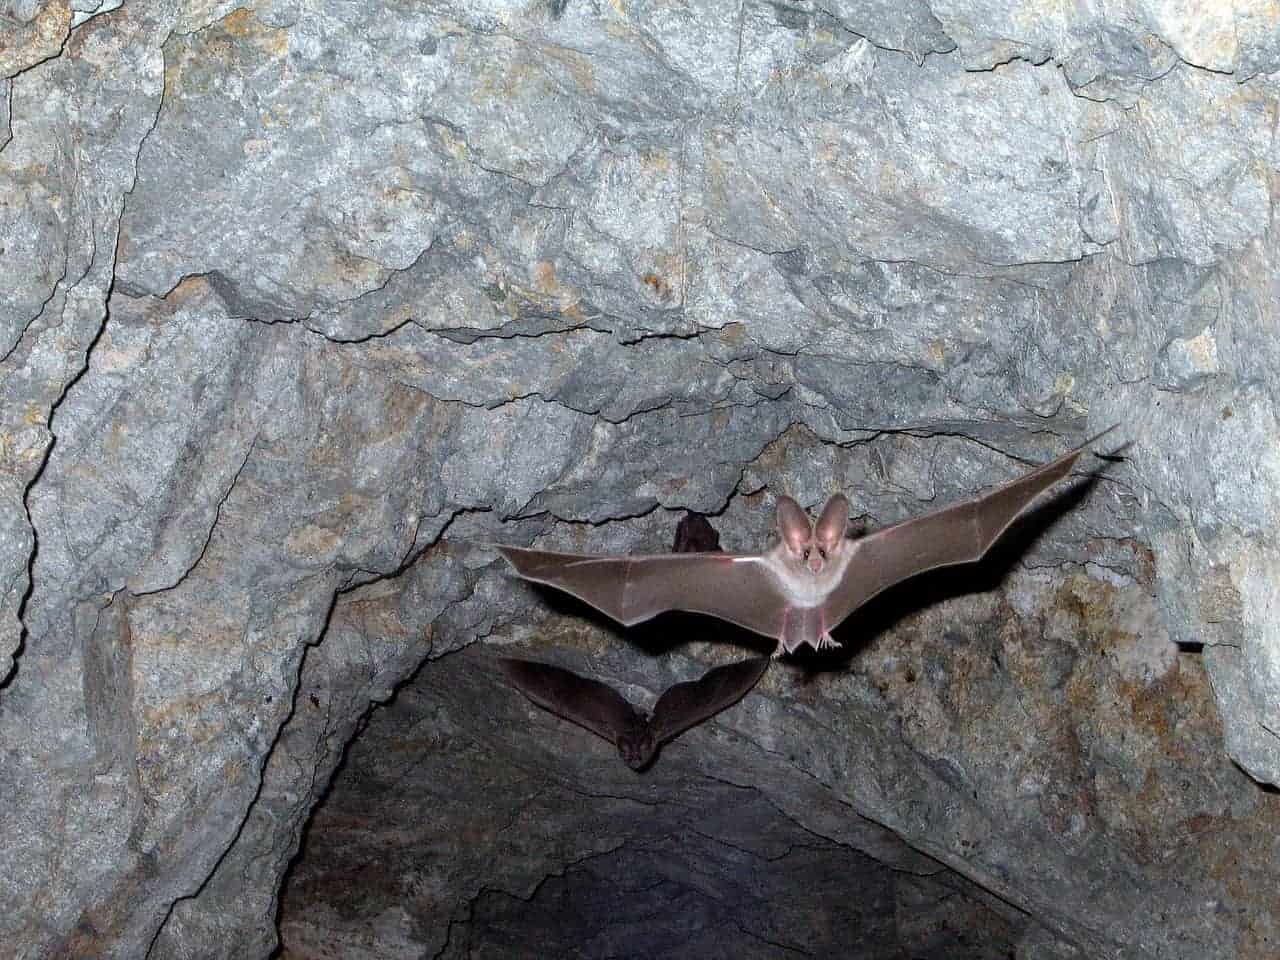 bat flying wings